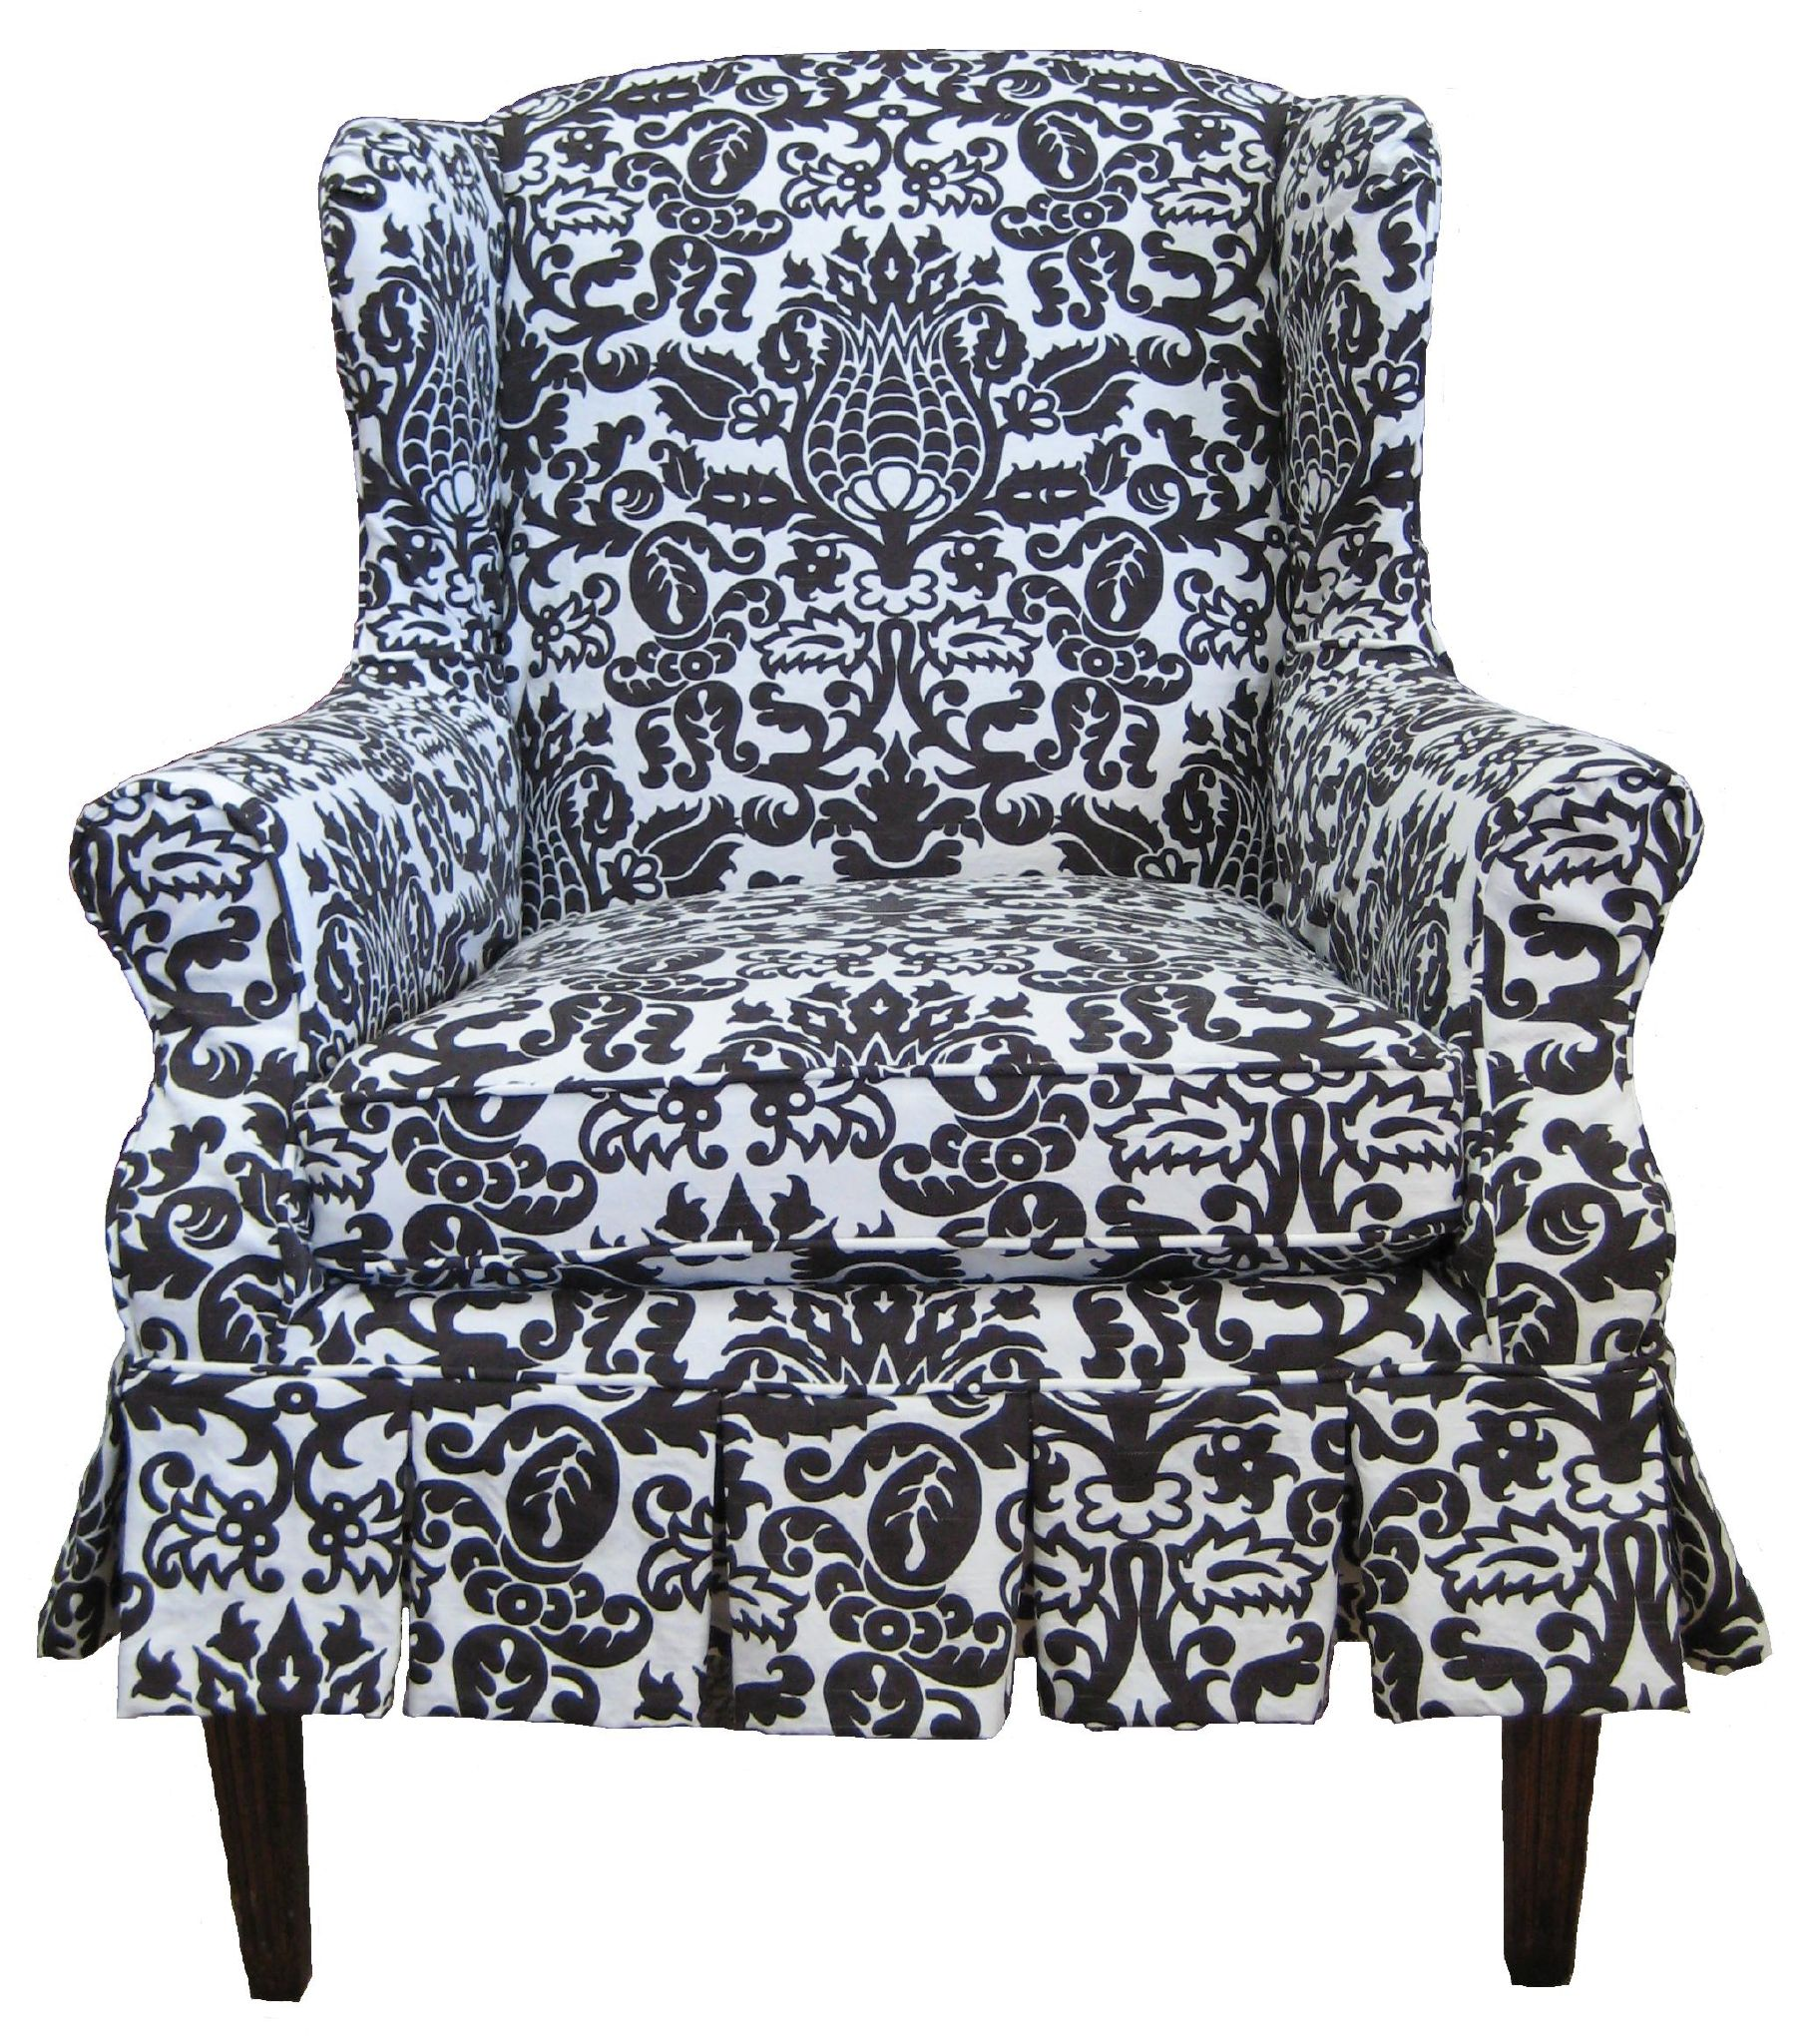 File Damask slipcovered wing chair Wikimedia